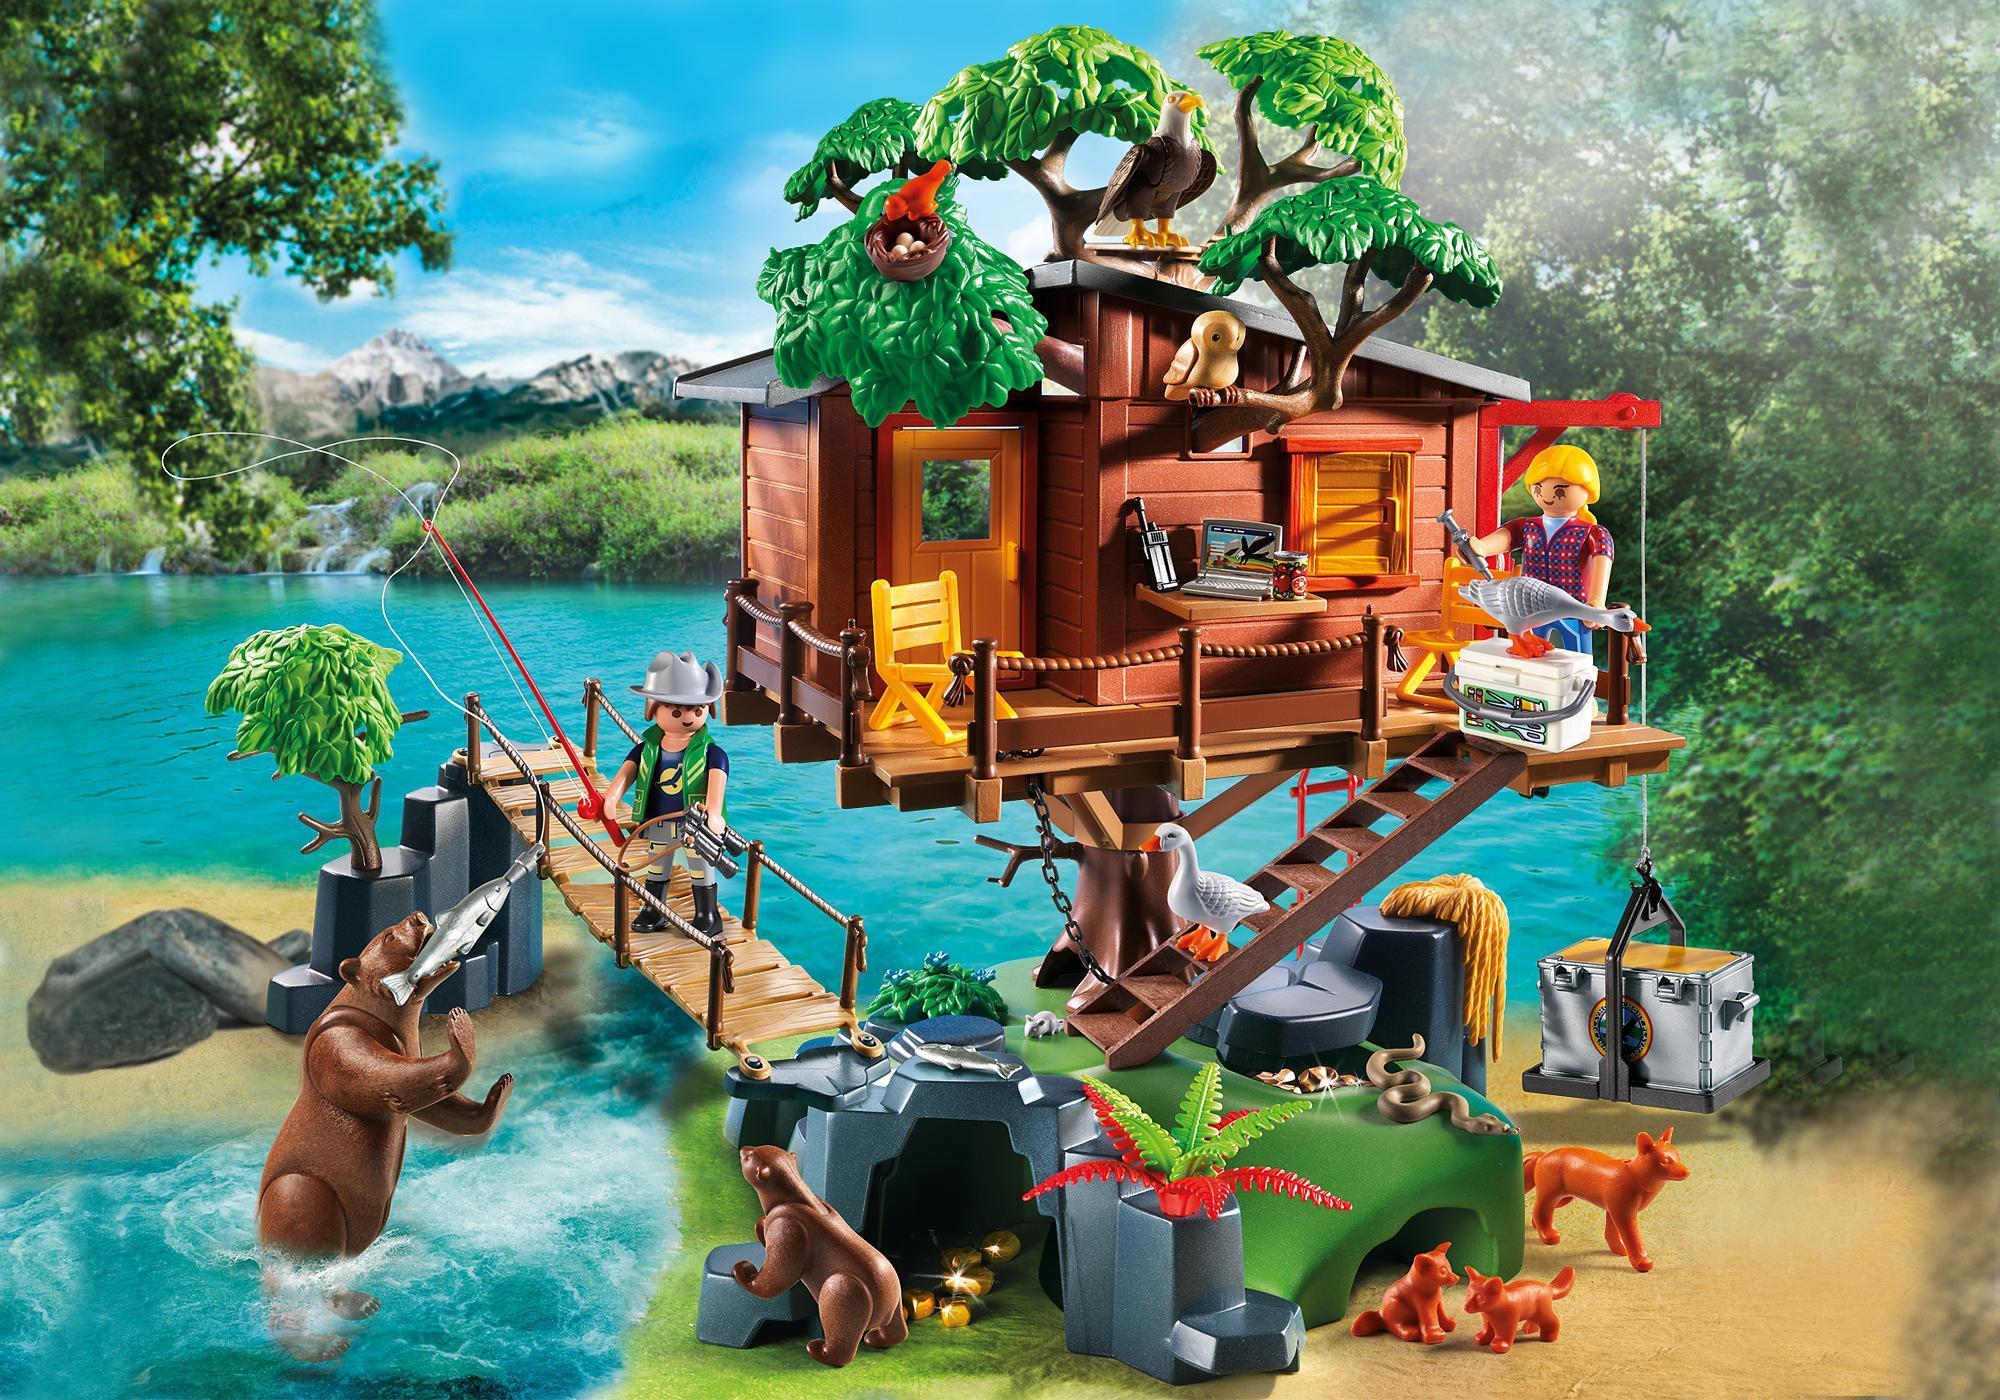 http://media.playmobil.com/i/playmobil/5557_product_detail/Adventure Tree House